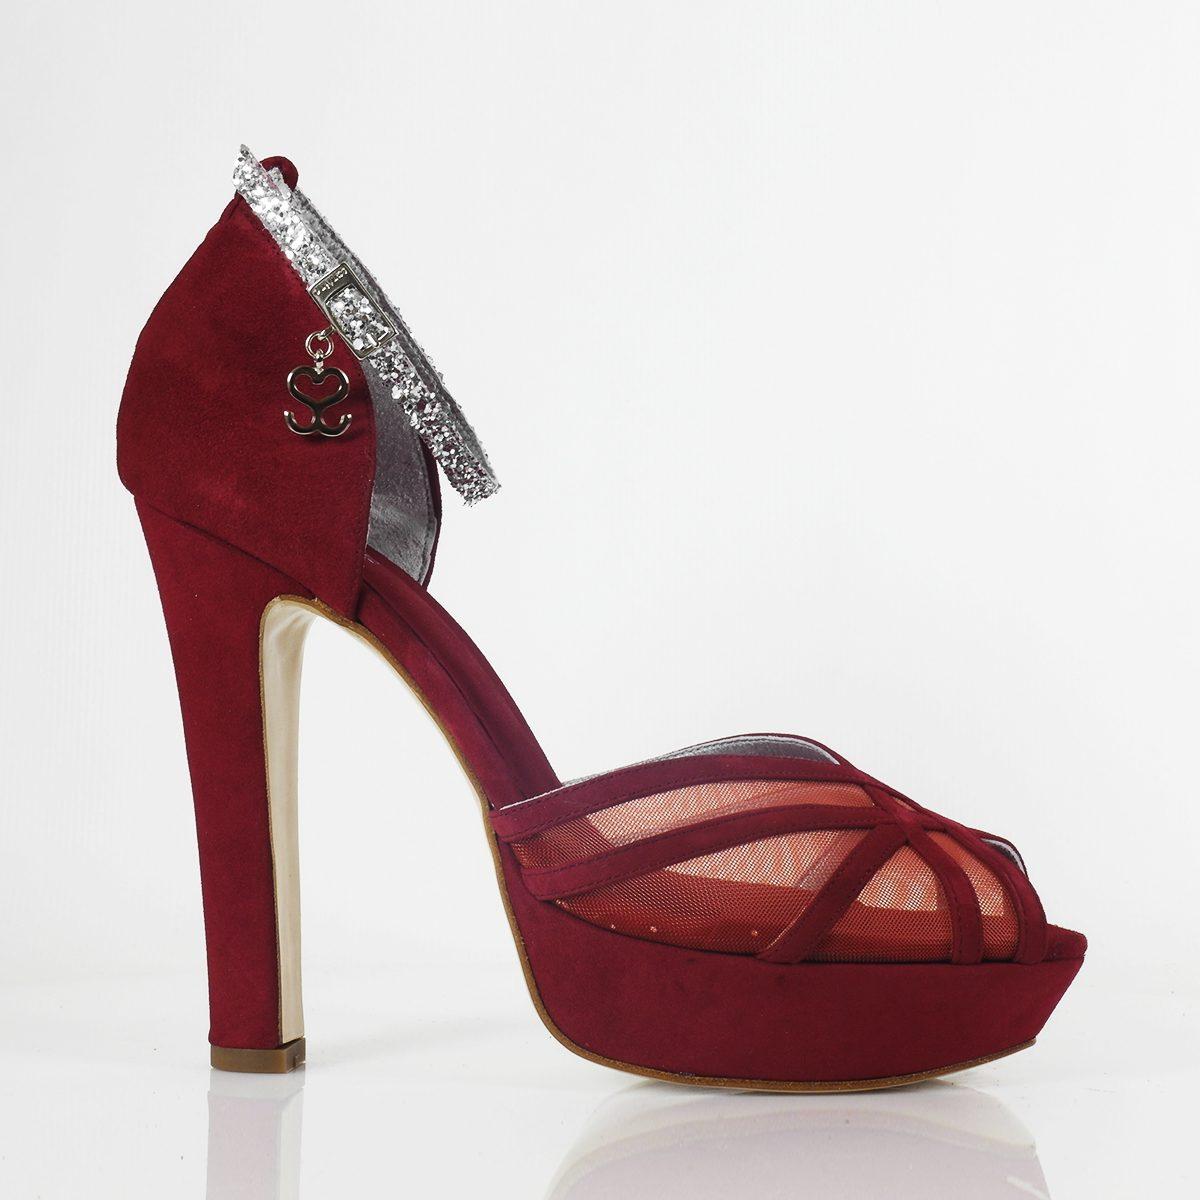 SANDALIA MOD.9639 (12,5cm) - Zapatos Personalizados Fiesta